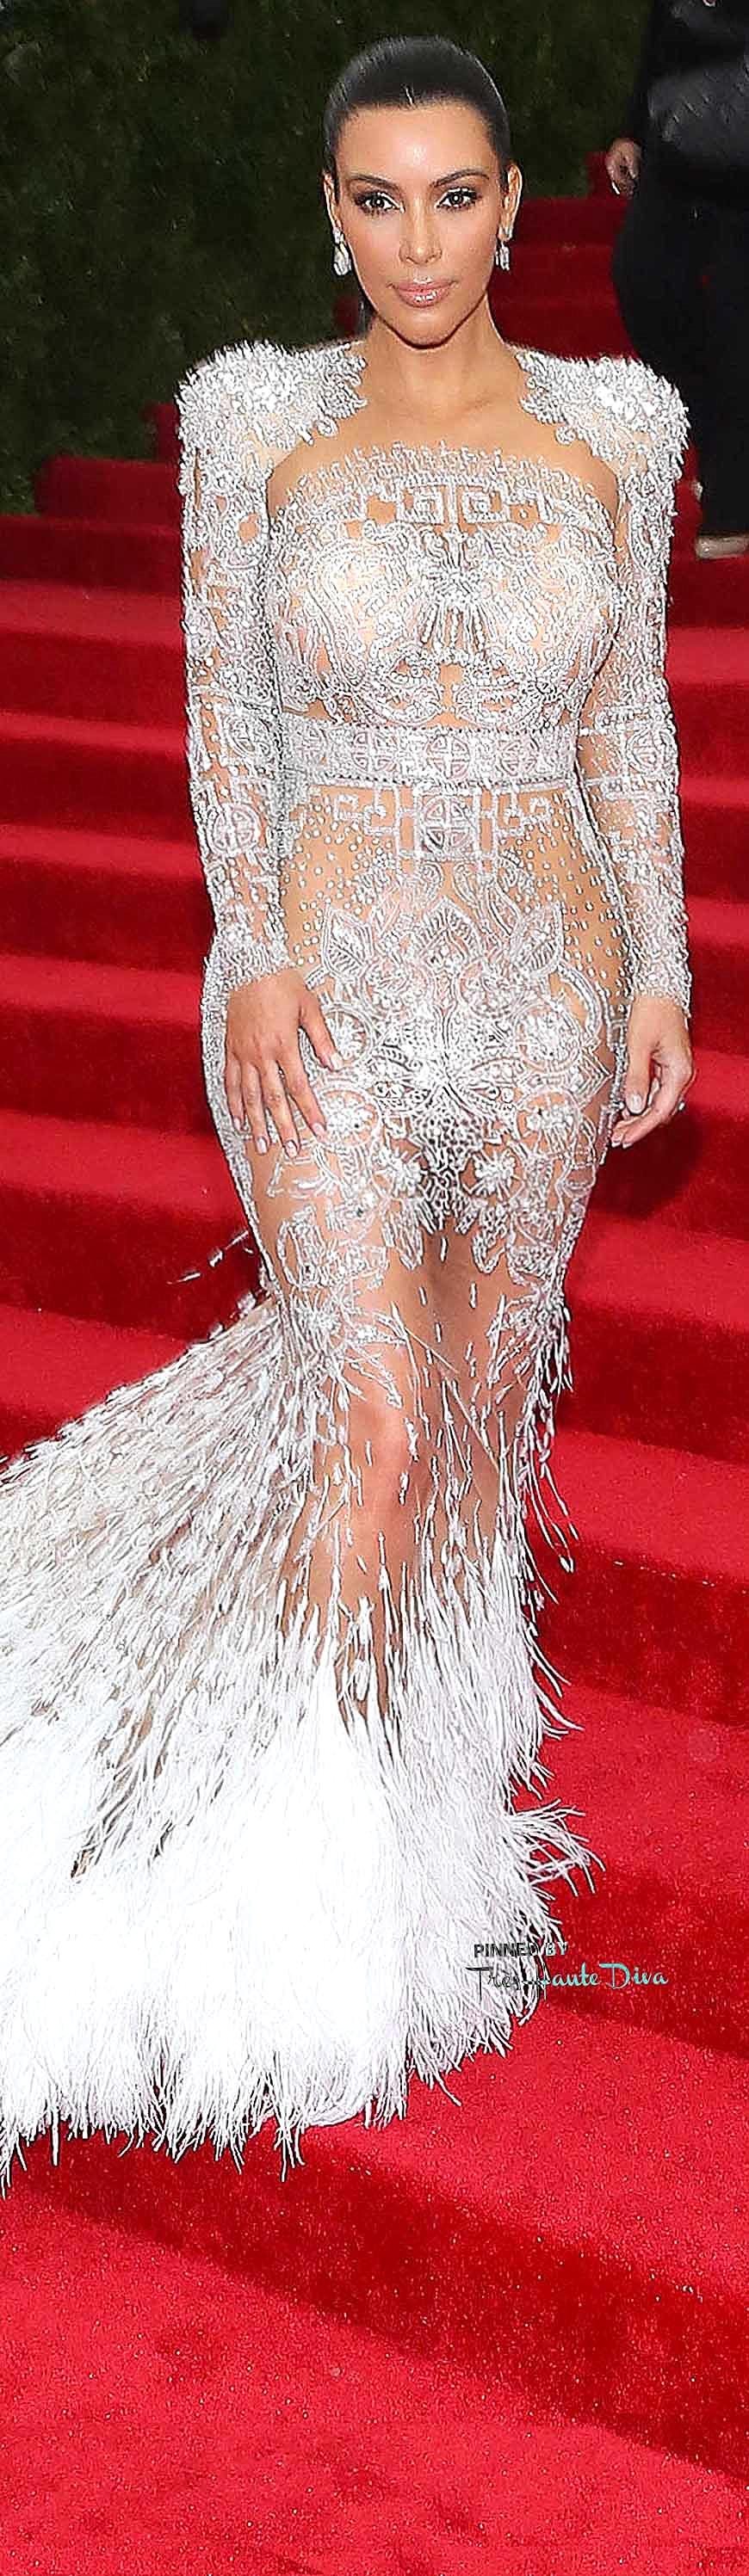 Kim Kardashian in Roberto Cavalli Getty Images / Taylor Hill